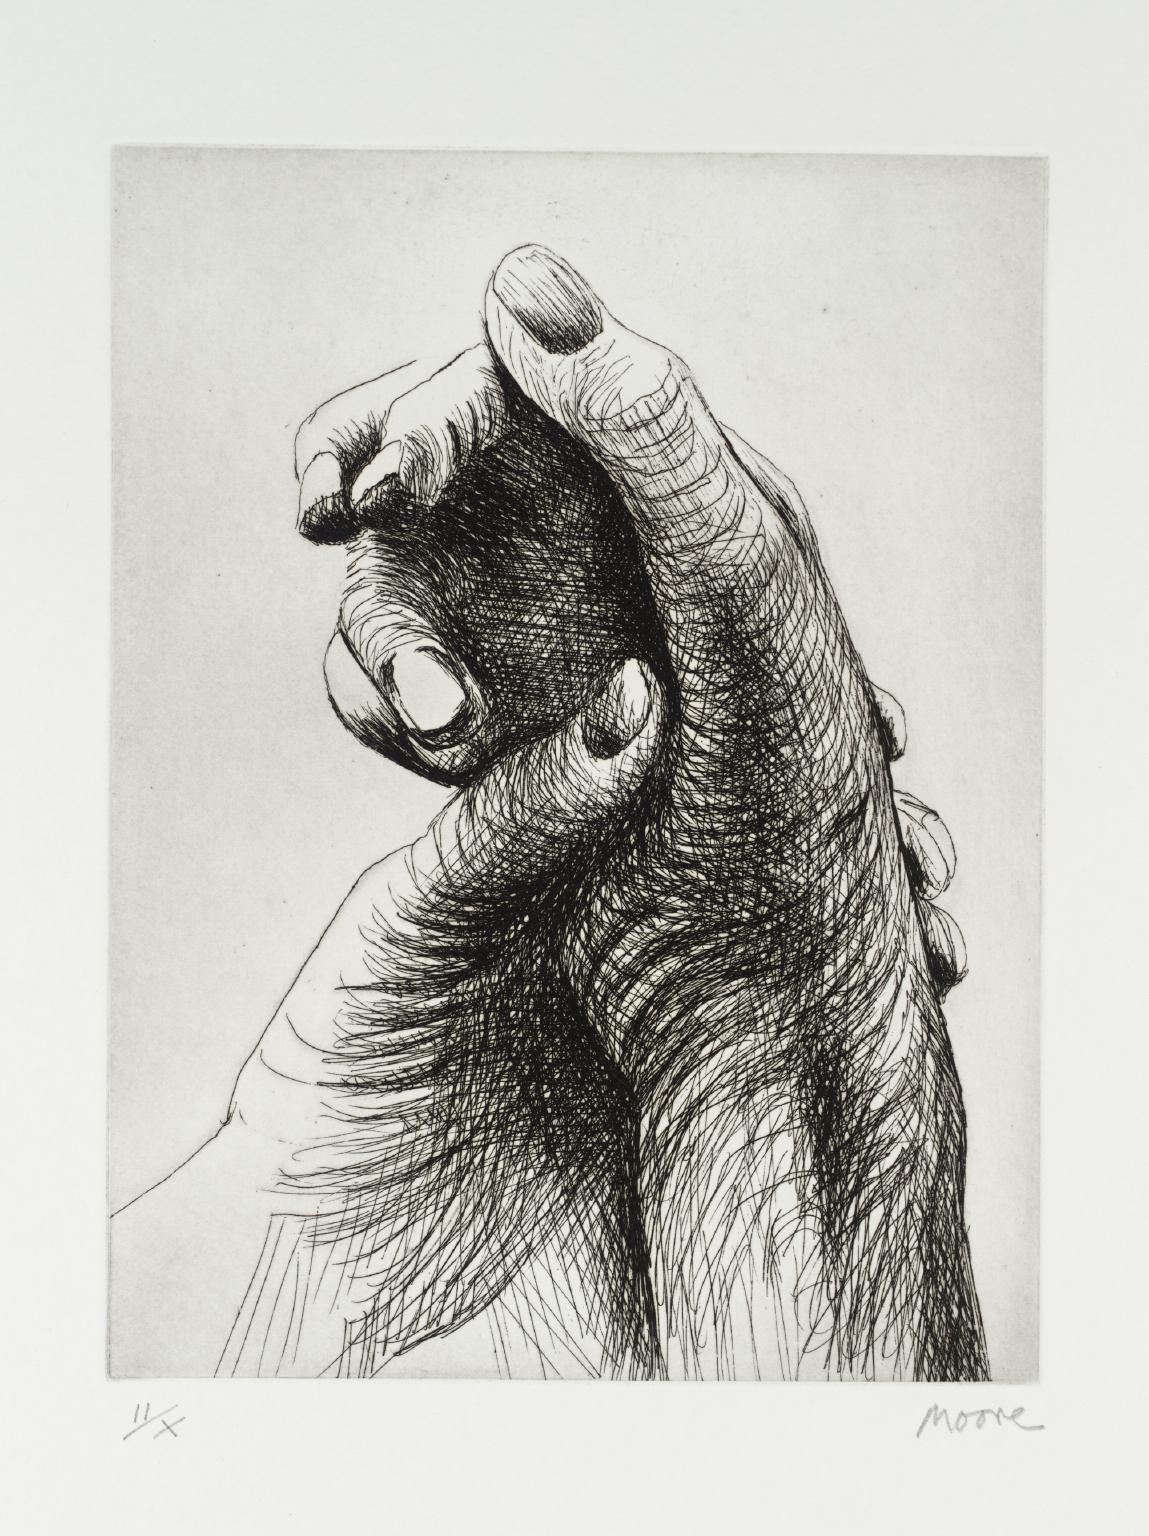 Henry Moore, The Artist's Hand IV, 1979